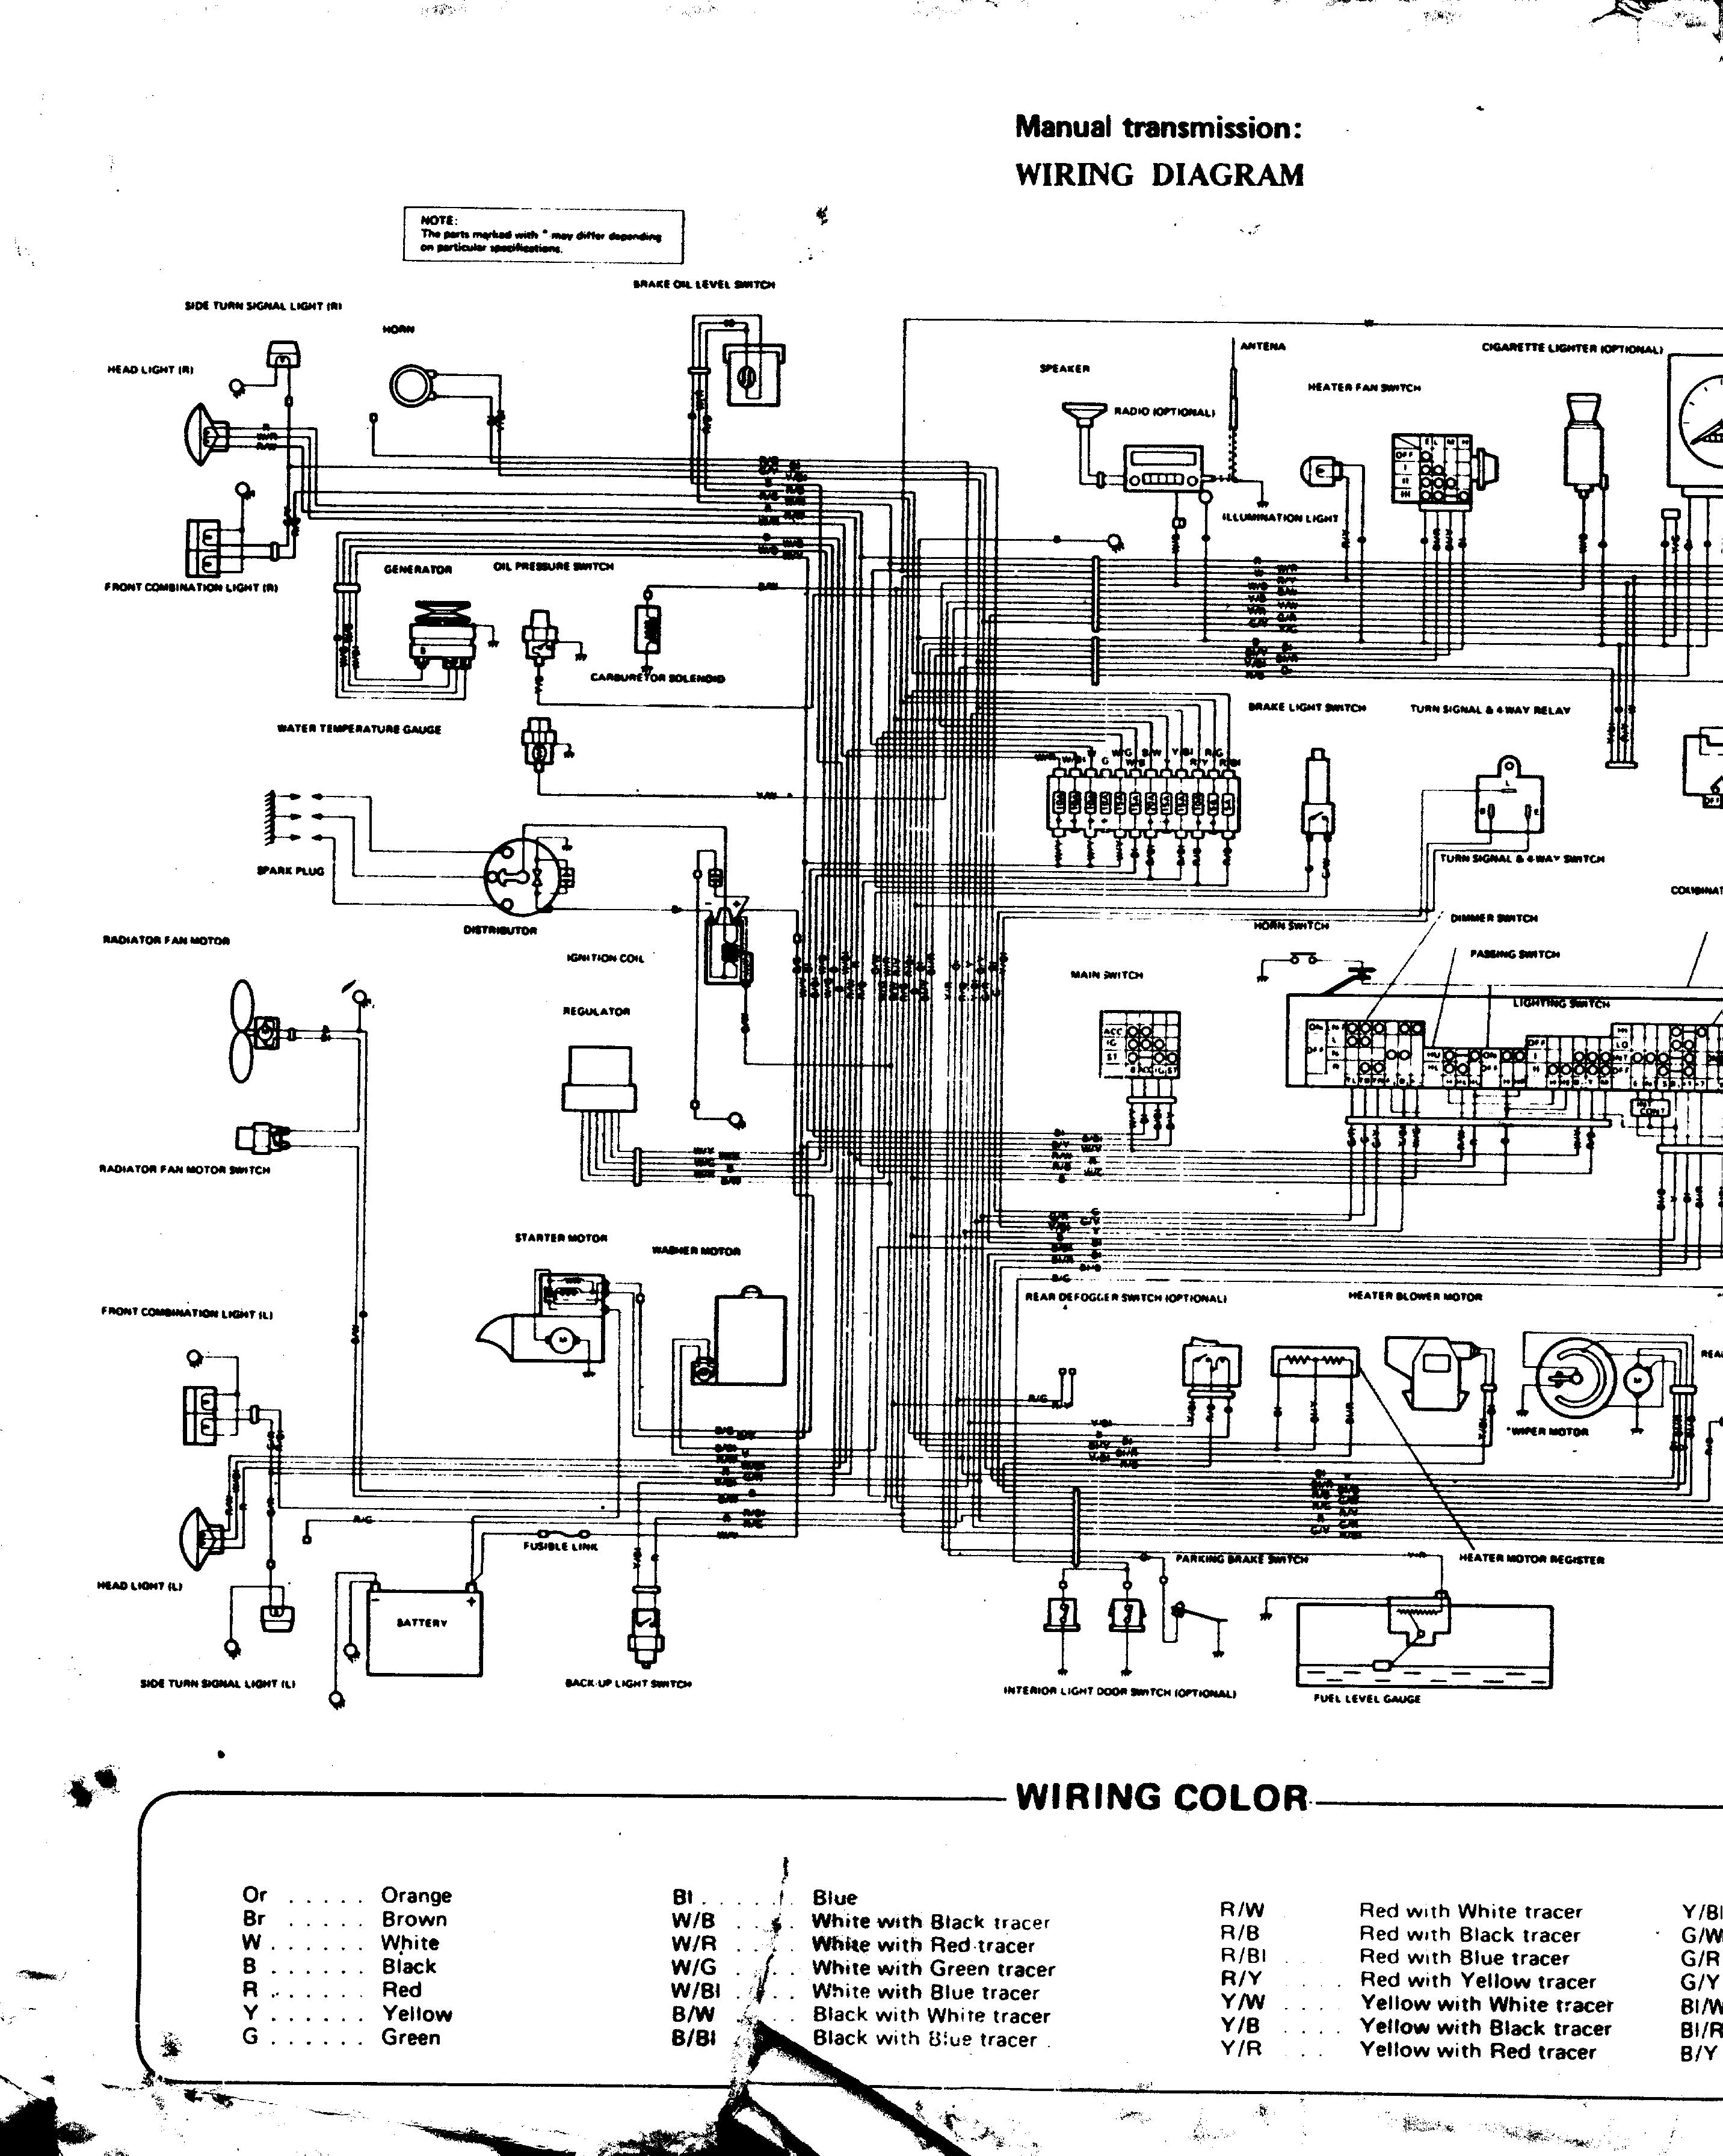 Service manual suzuki alto 800cc suzuki alto 001g electrical suzuki alto 800cc electrical wiring diagram for suzuki alto iin pakistan from 83 to 2009 cheapraybanclubmaster Images